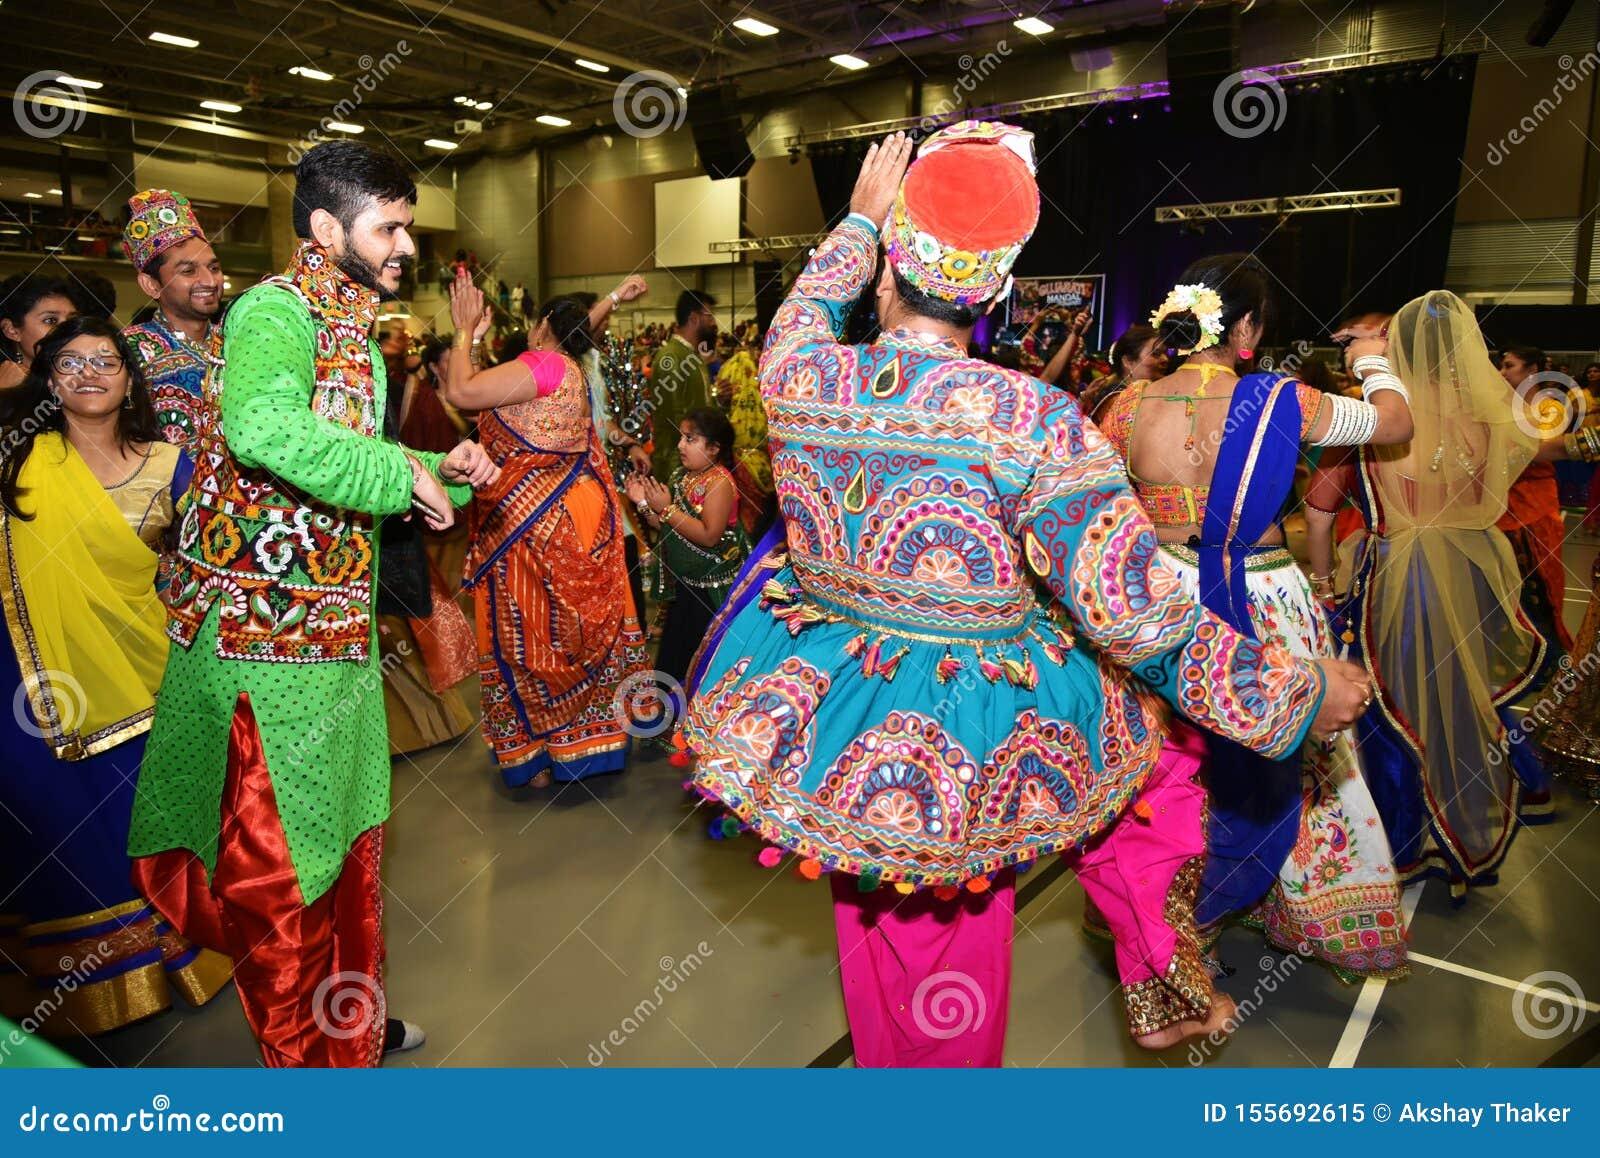 Girls Man Women Are Performing Garba And Dandiya Dance Wearing Traditional Indian Folk Dress During Navratri Festival Canada Editorial Image Image Of Celebration Also 155692615